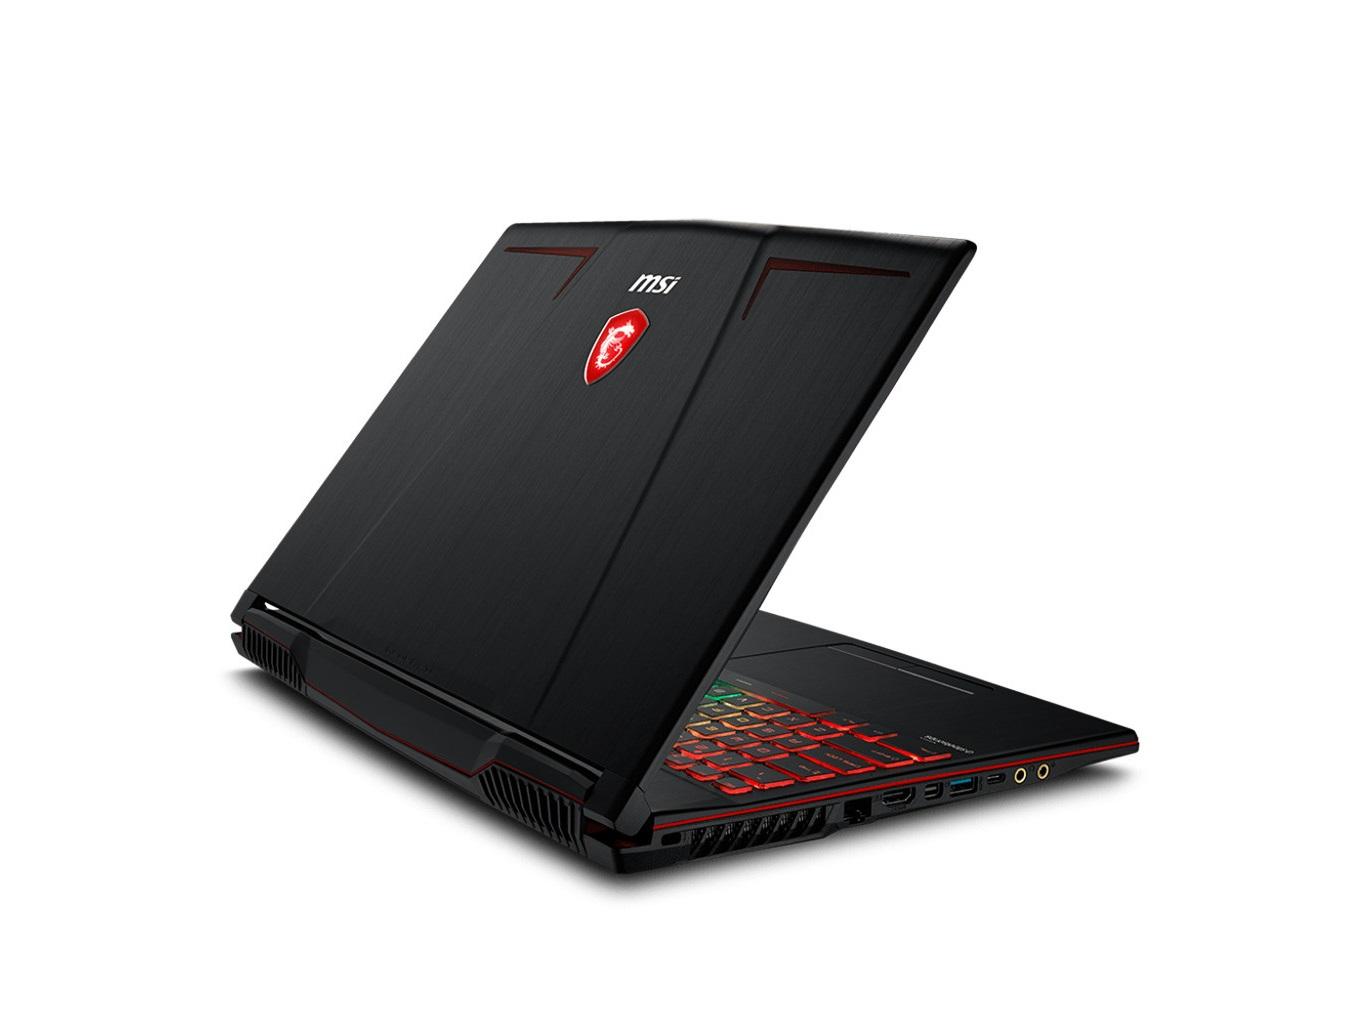 Về thiết kế của laptop gaming MSI